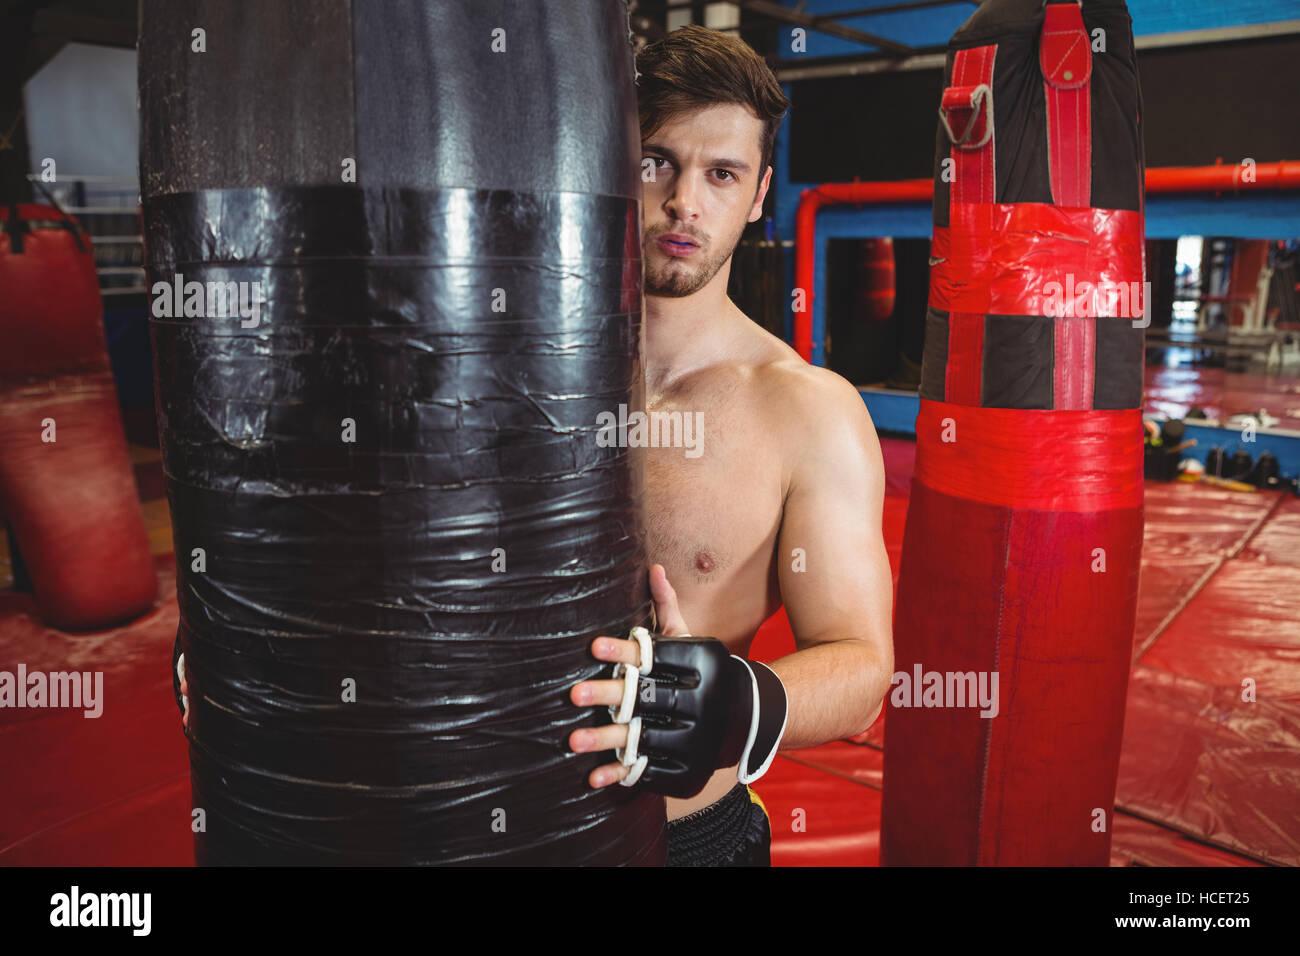 Boxer holding a punching bag - Stock Image